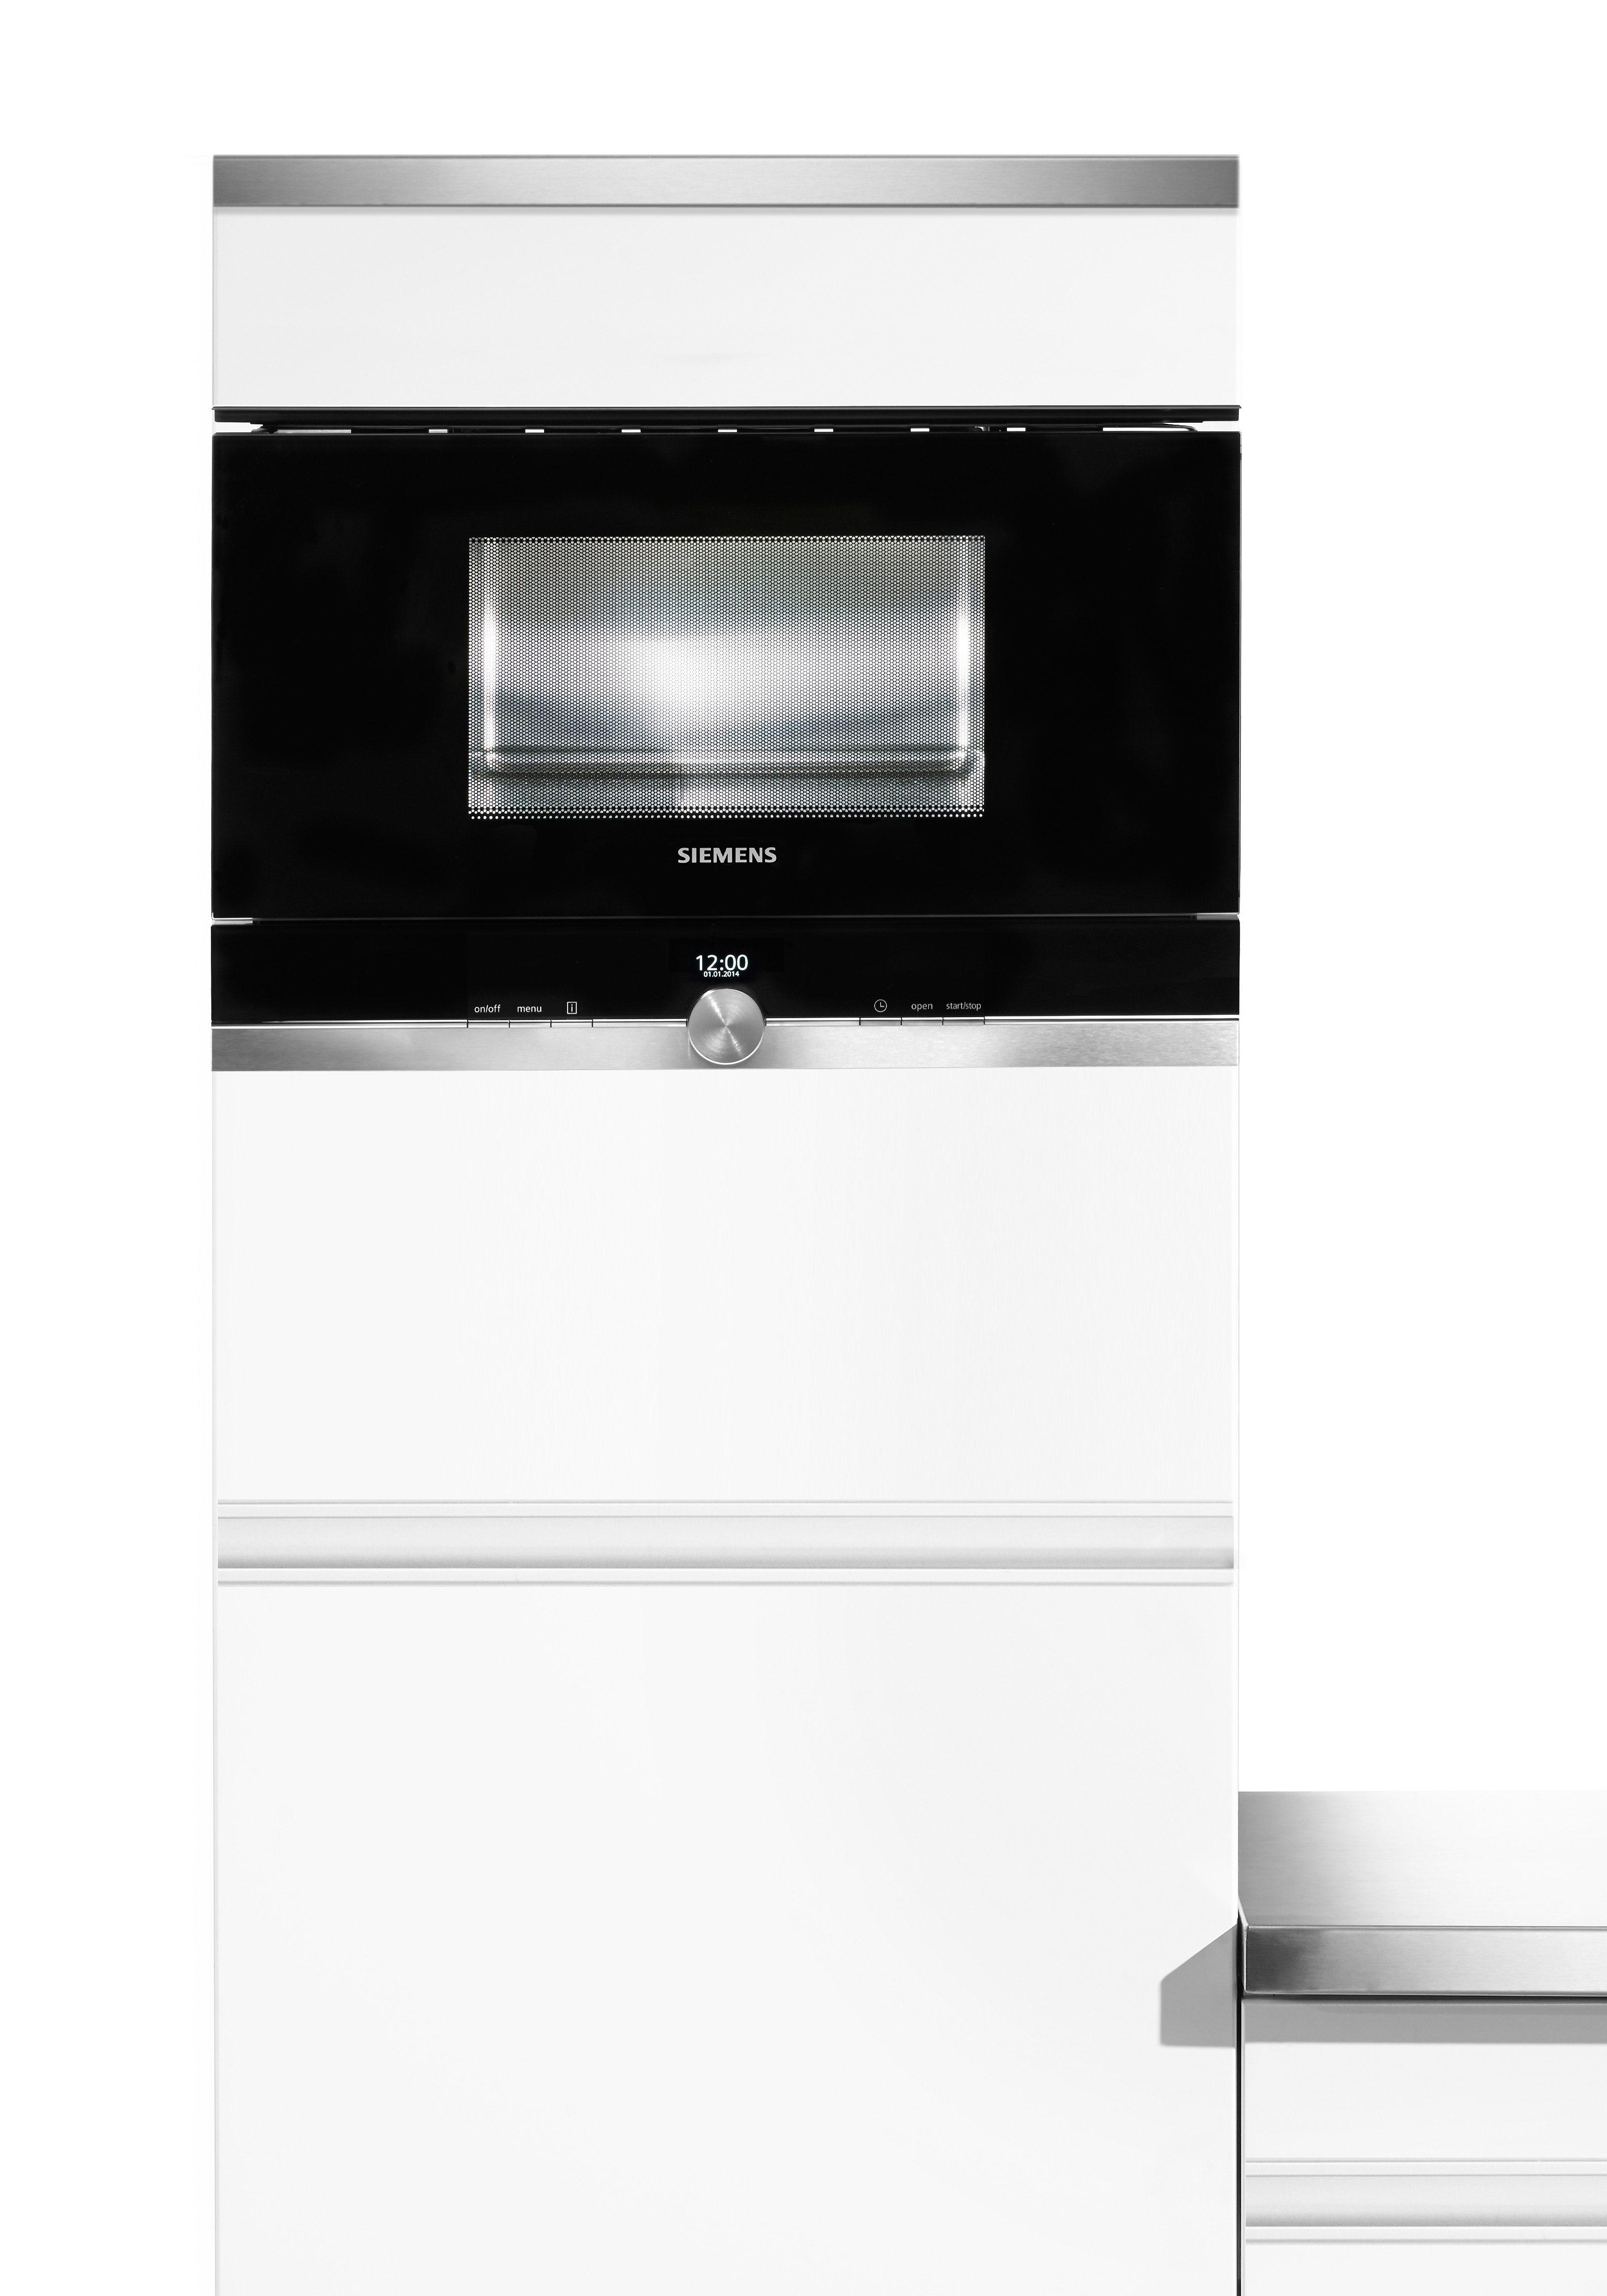 SIEMENS Einbau-Mikrowelle BE634RGS1, Mikrowelle-Grill, 900 W